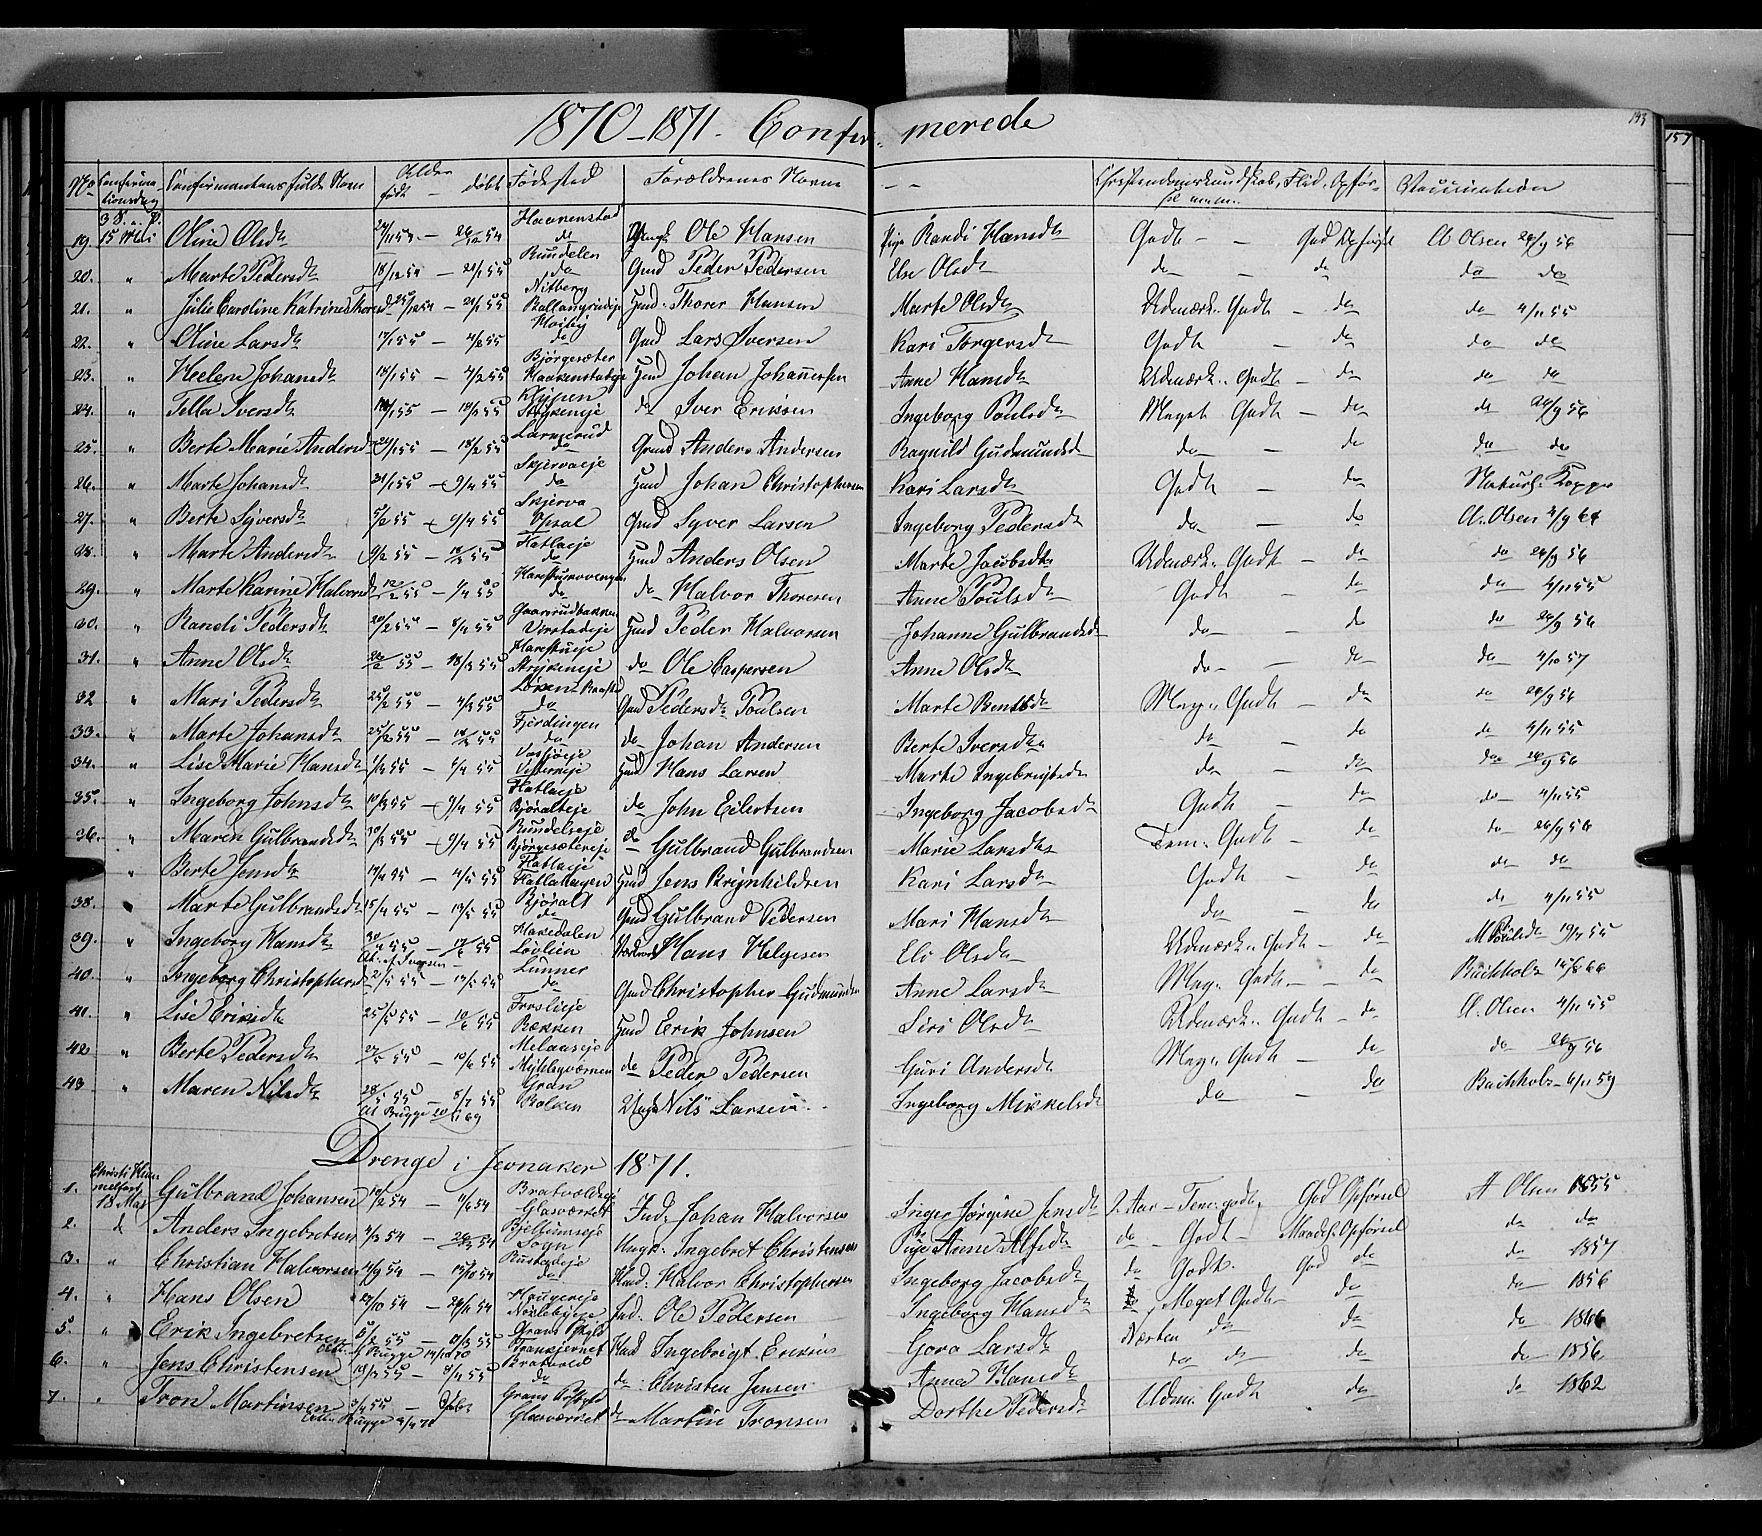 SAH, Jevnaker prestekontor, Ministerialbok nr. 7, 1858-1876, s. 143